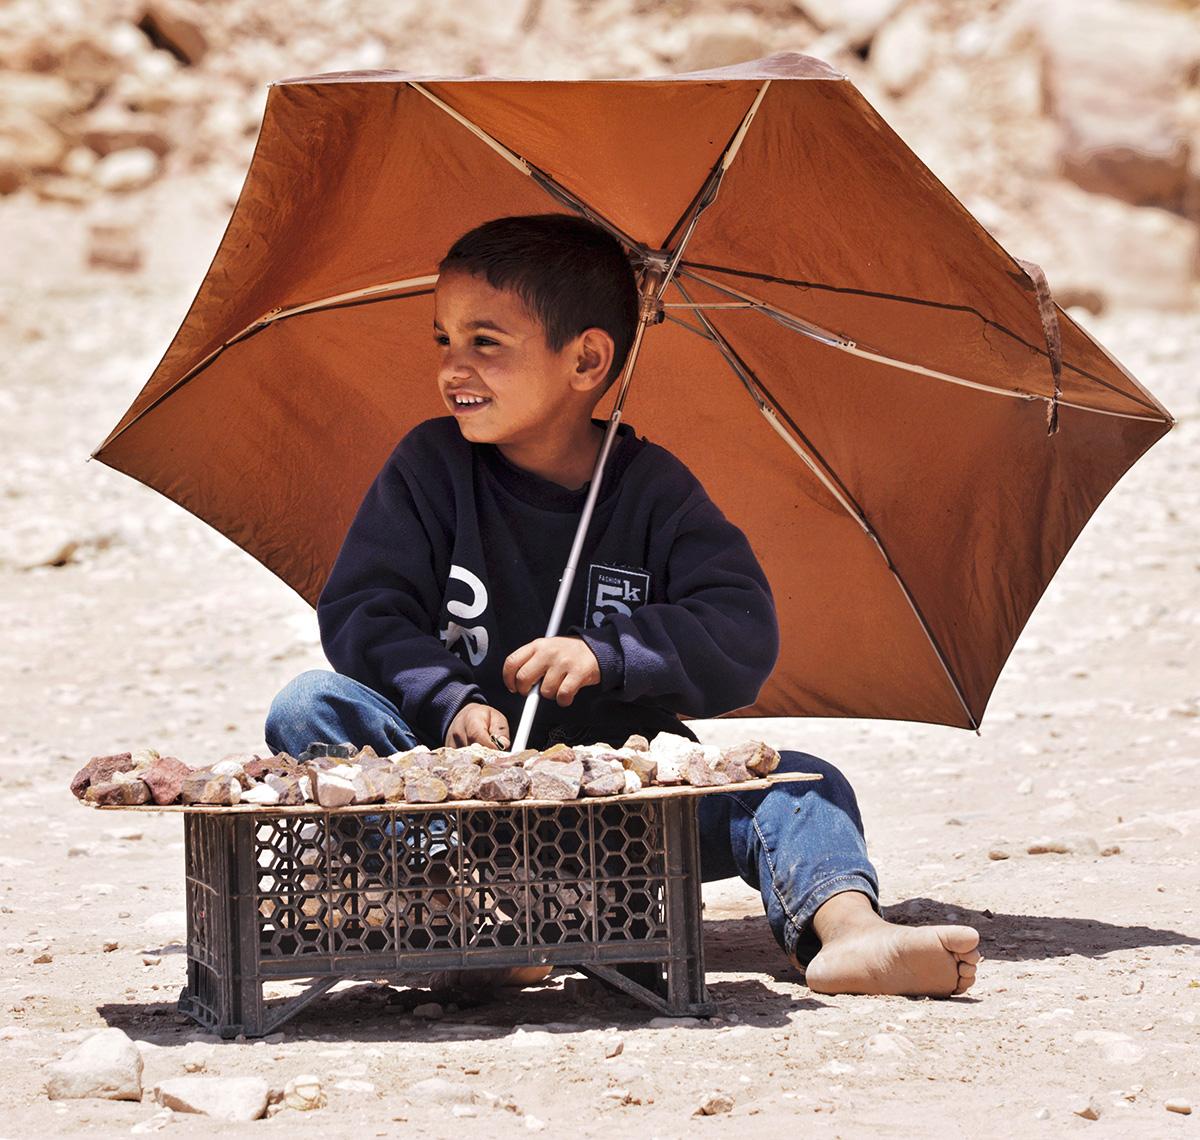 Bambino venditore di pietre a Petra